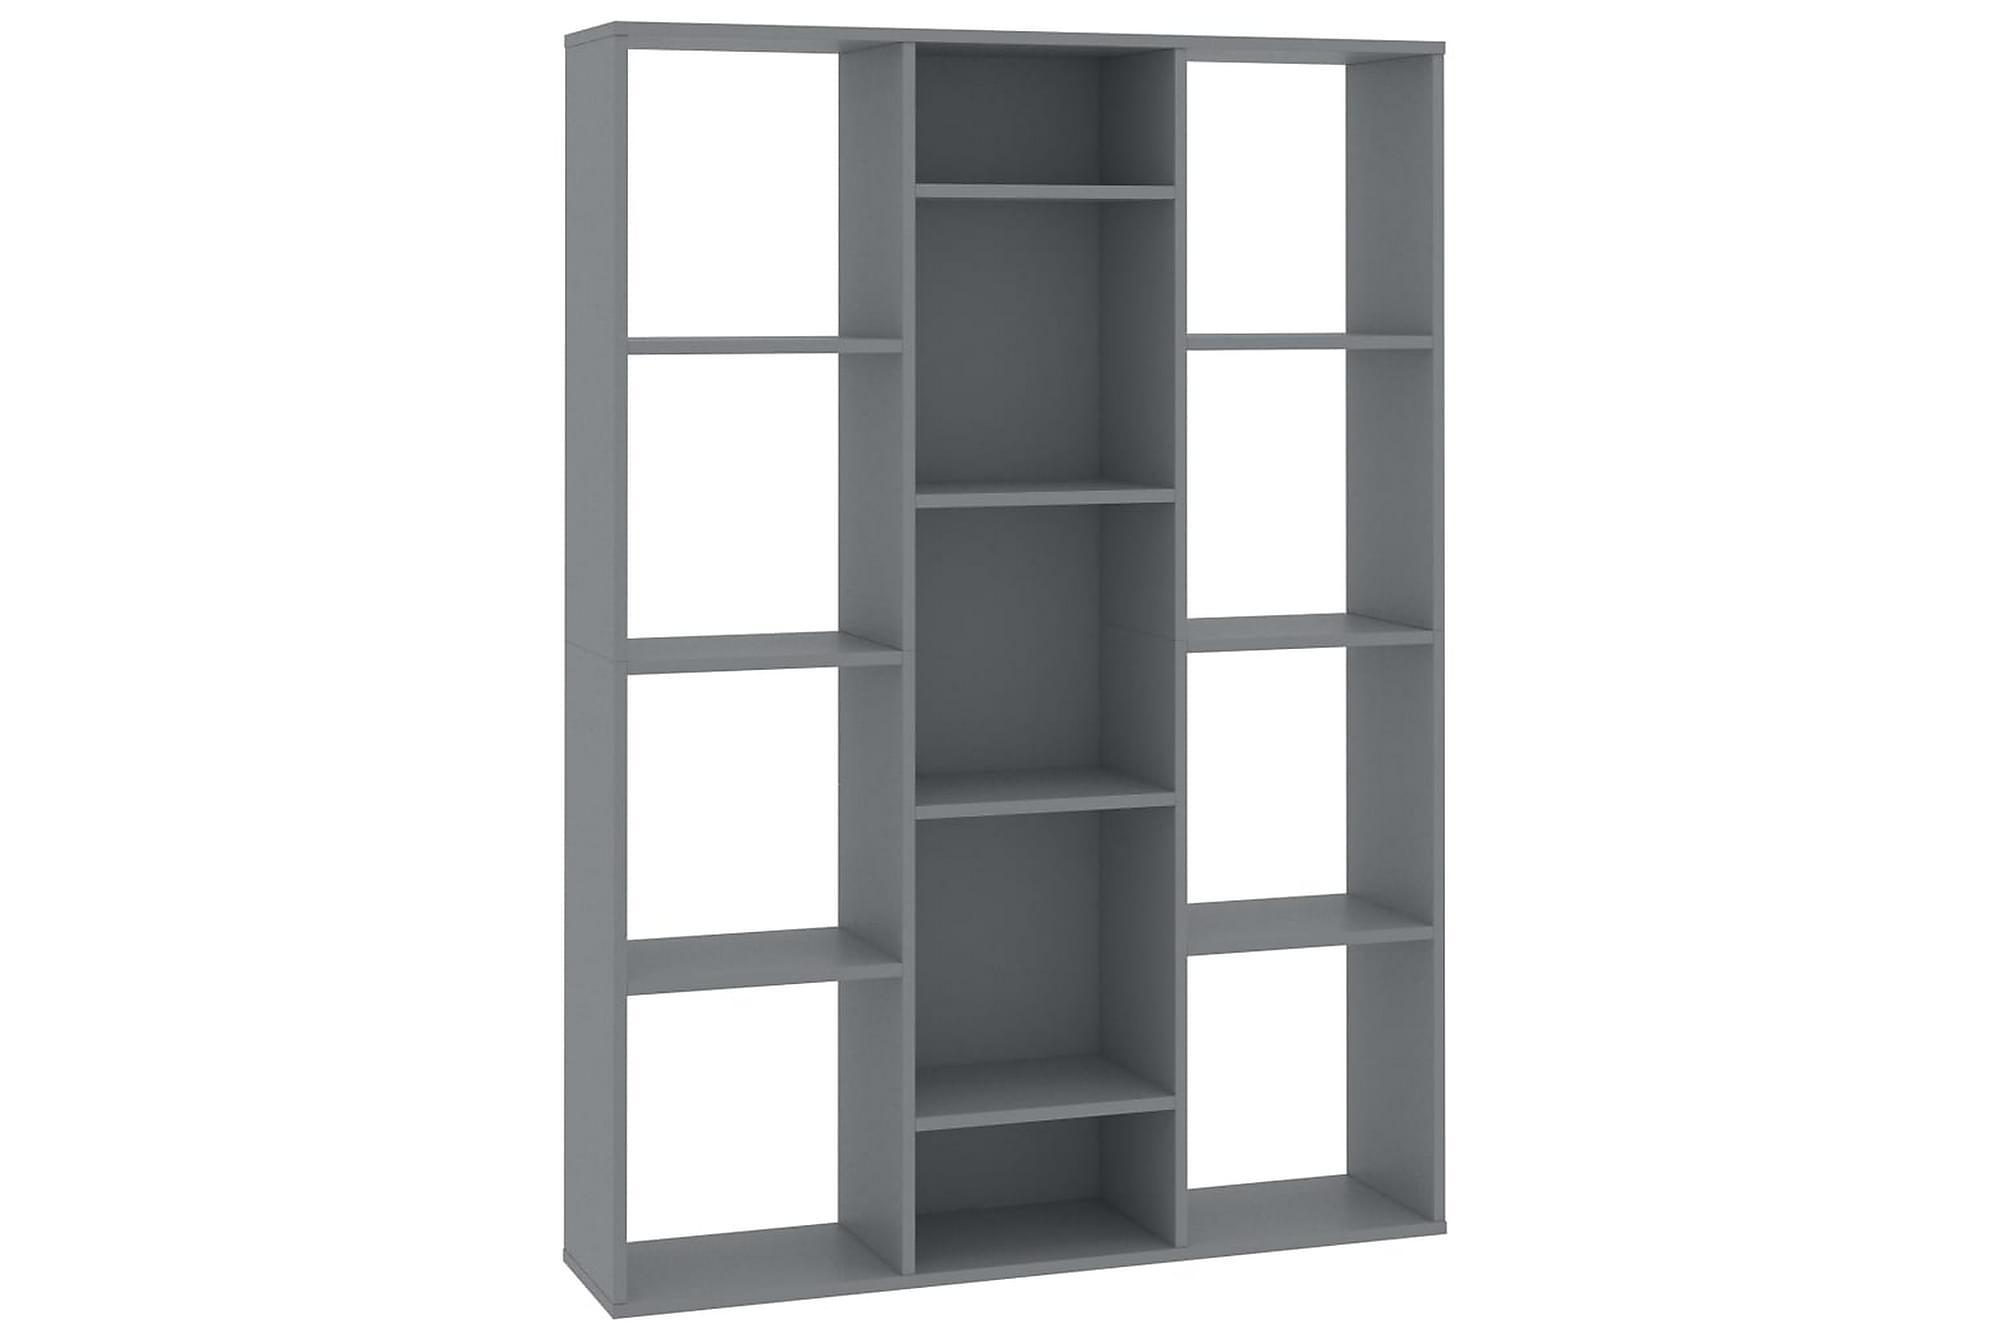 Rumsavdelare/bokhylla grå 100x24x140 cm spånskiva